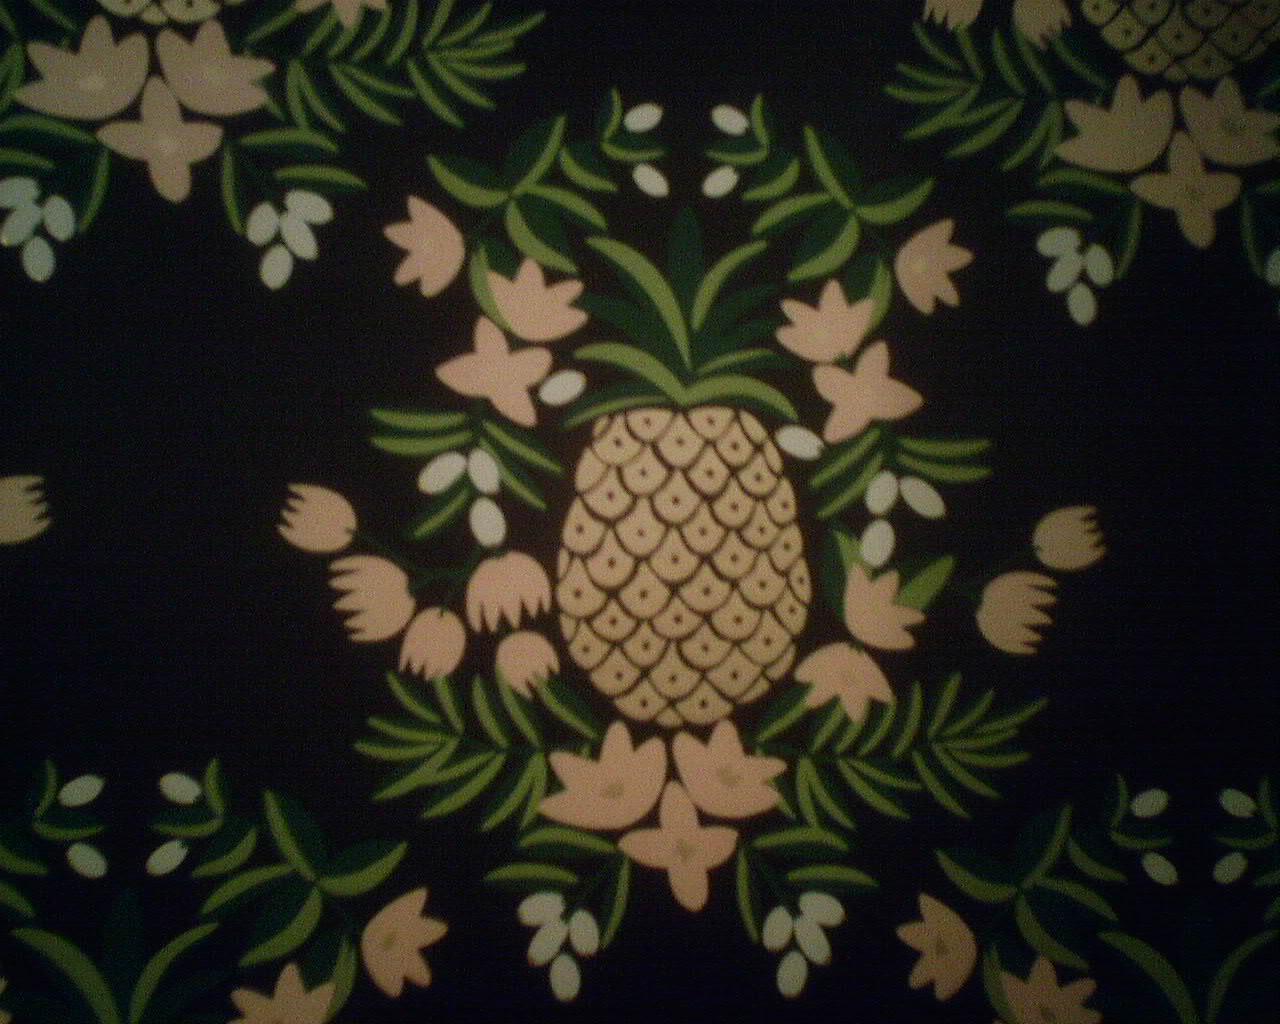 Good Wallpaper Home Screen Pineapple - dsc00057  Snapshot_128716.jpg